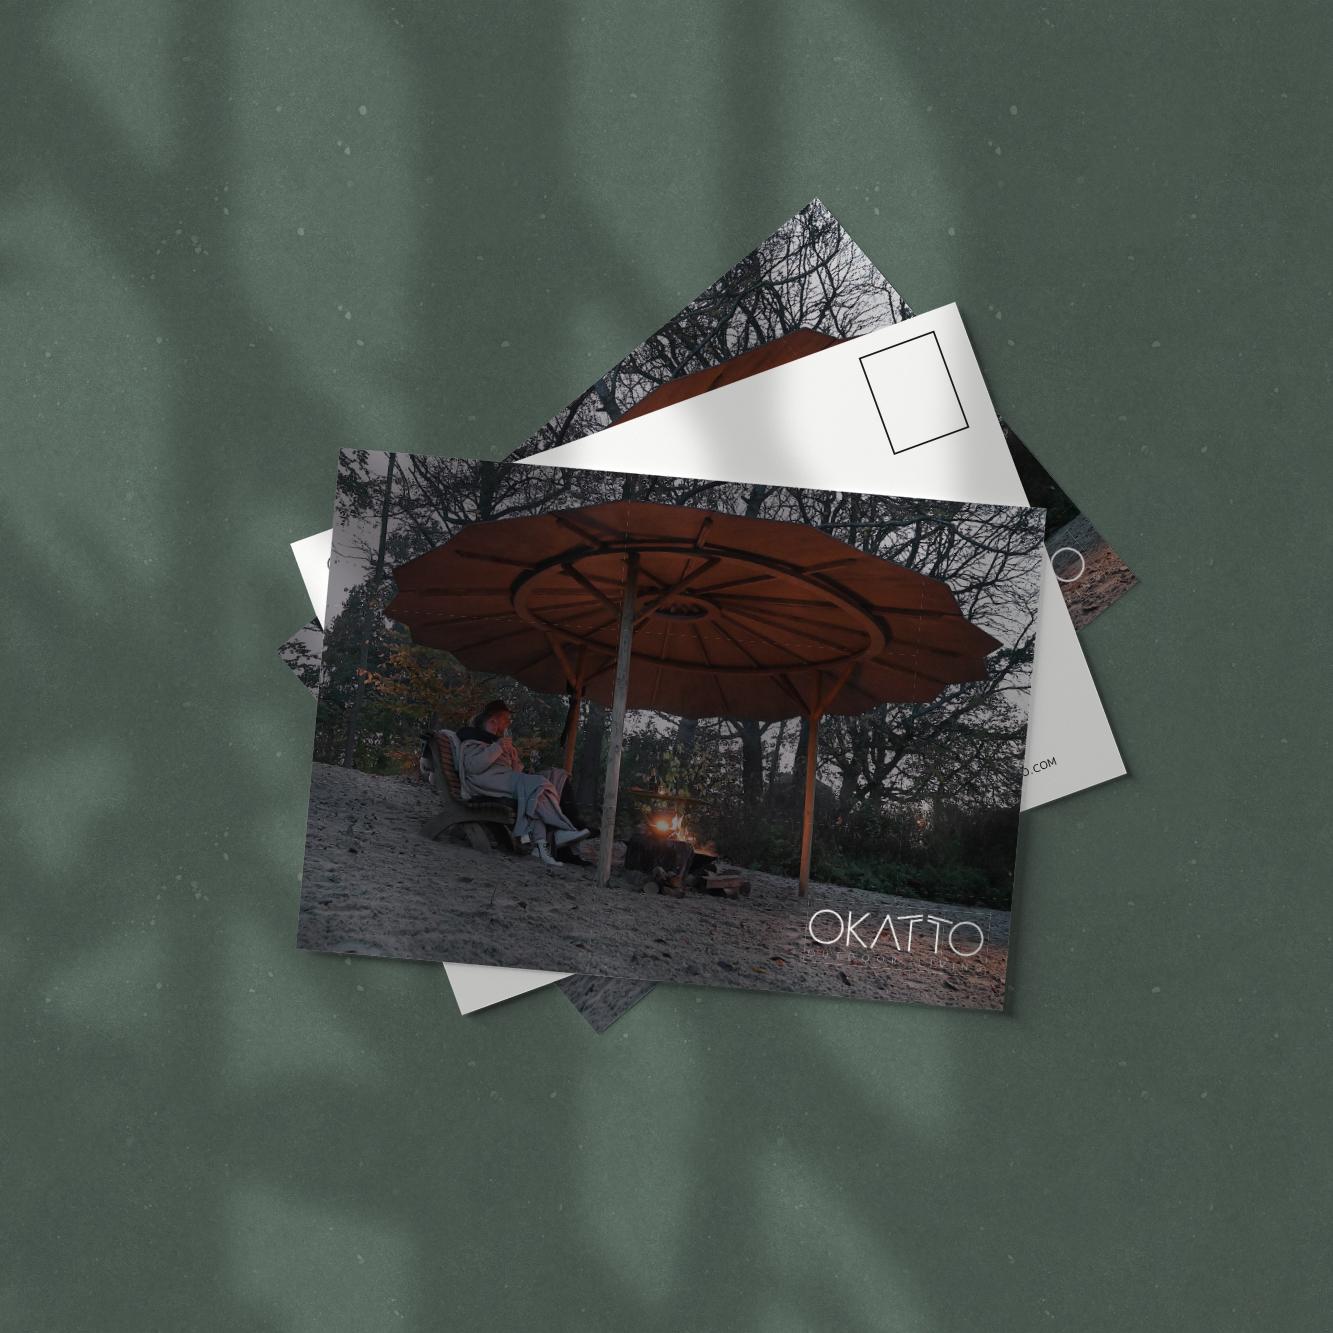 Mark-up-agency-Postcard-Okatto